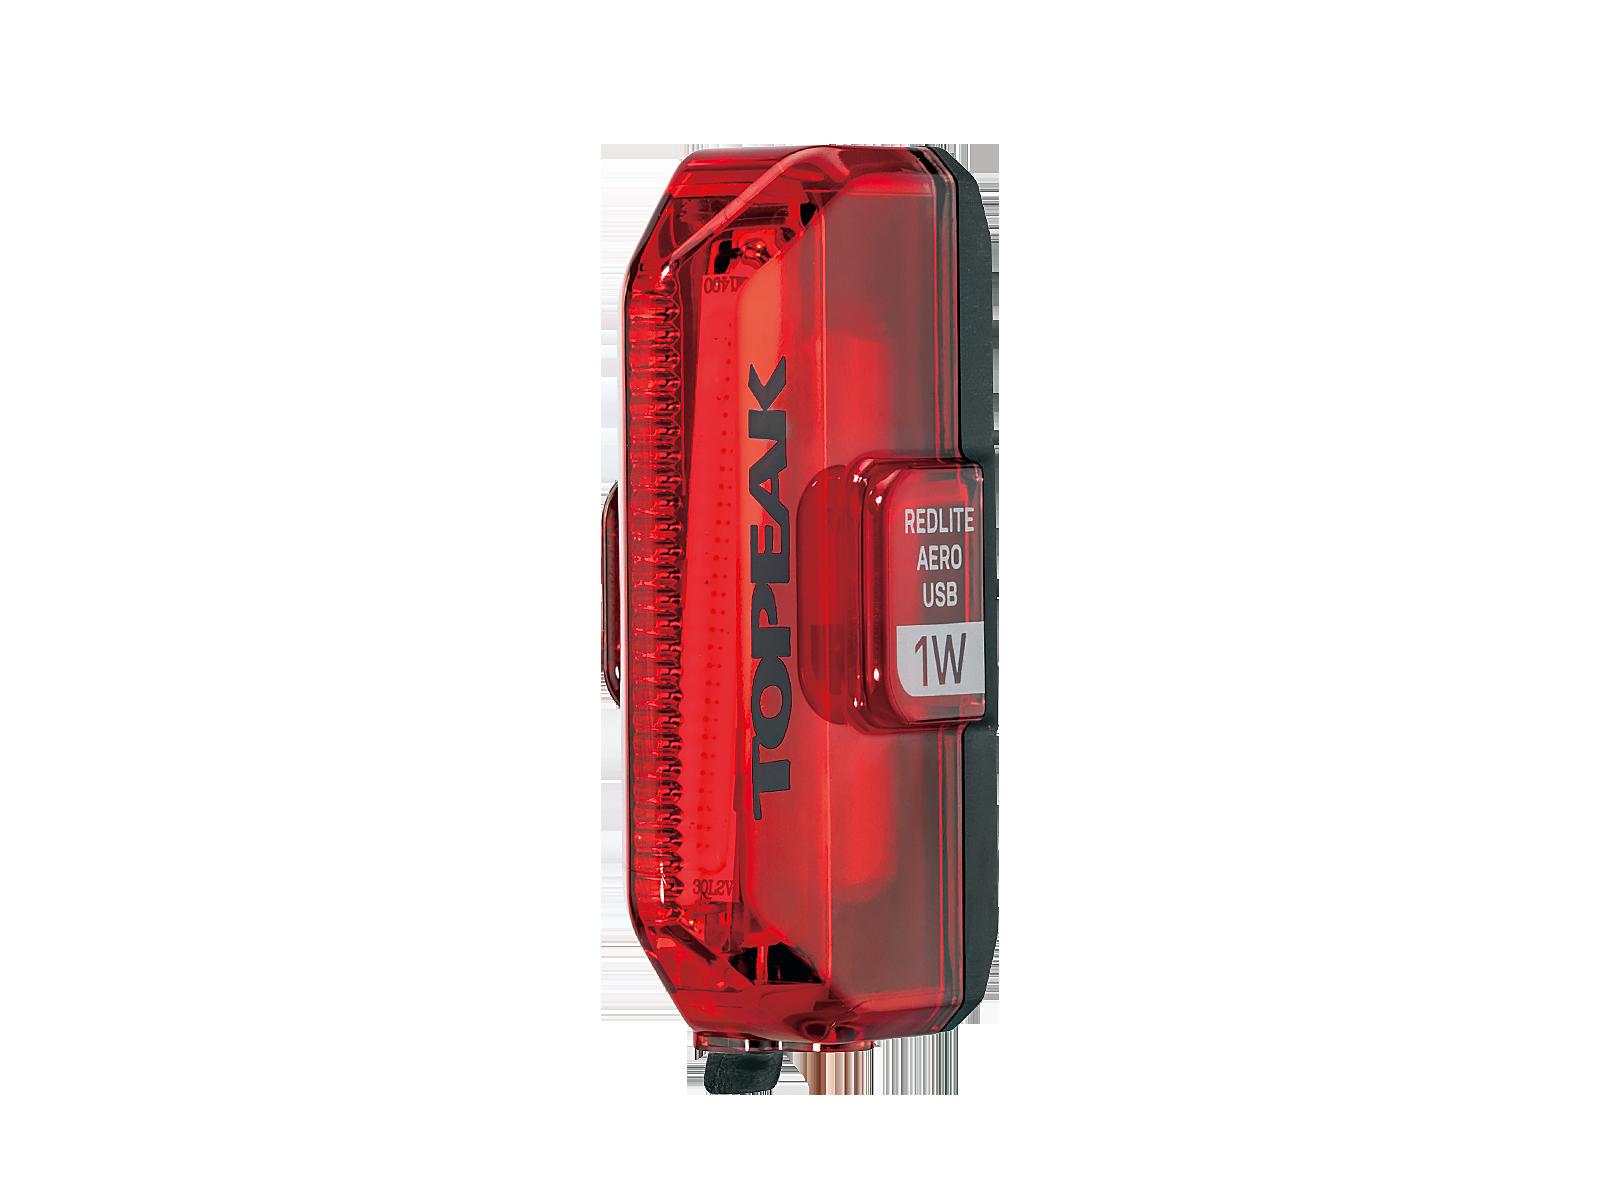 REDLITE™ AERO USB 1W | Topeak